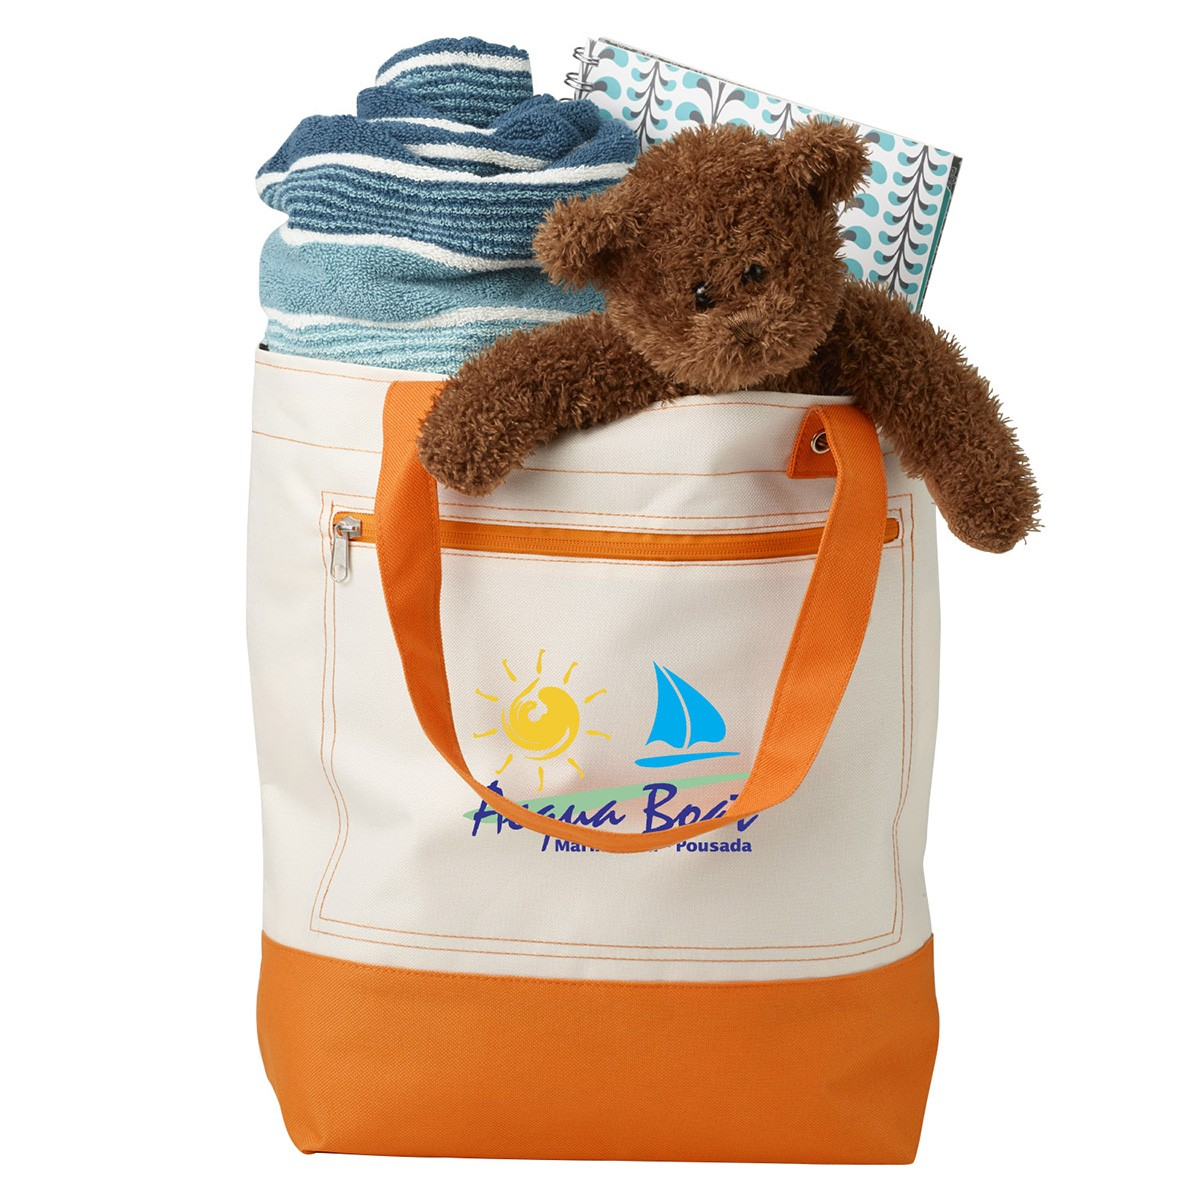 2019 Quick Seller Marina Boat  Cotton Tote Bag